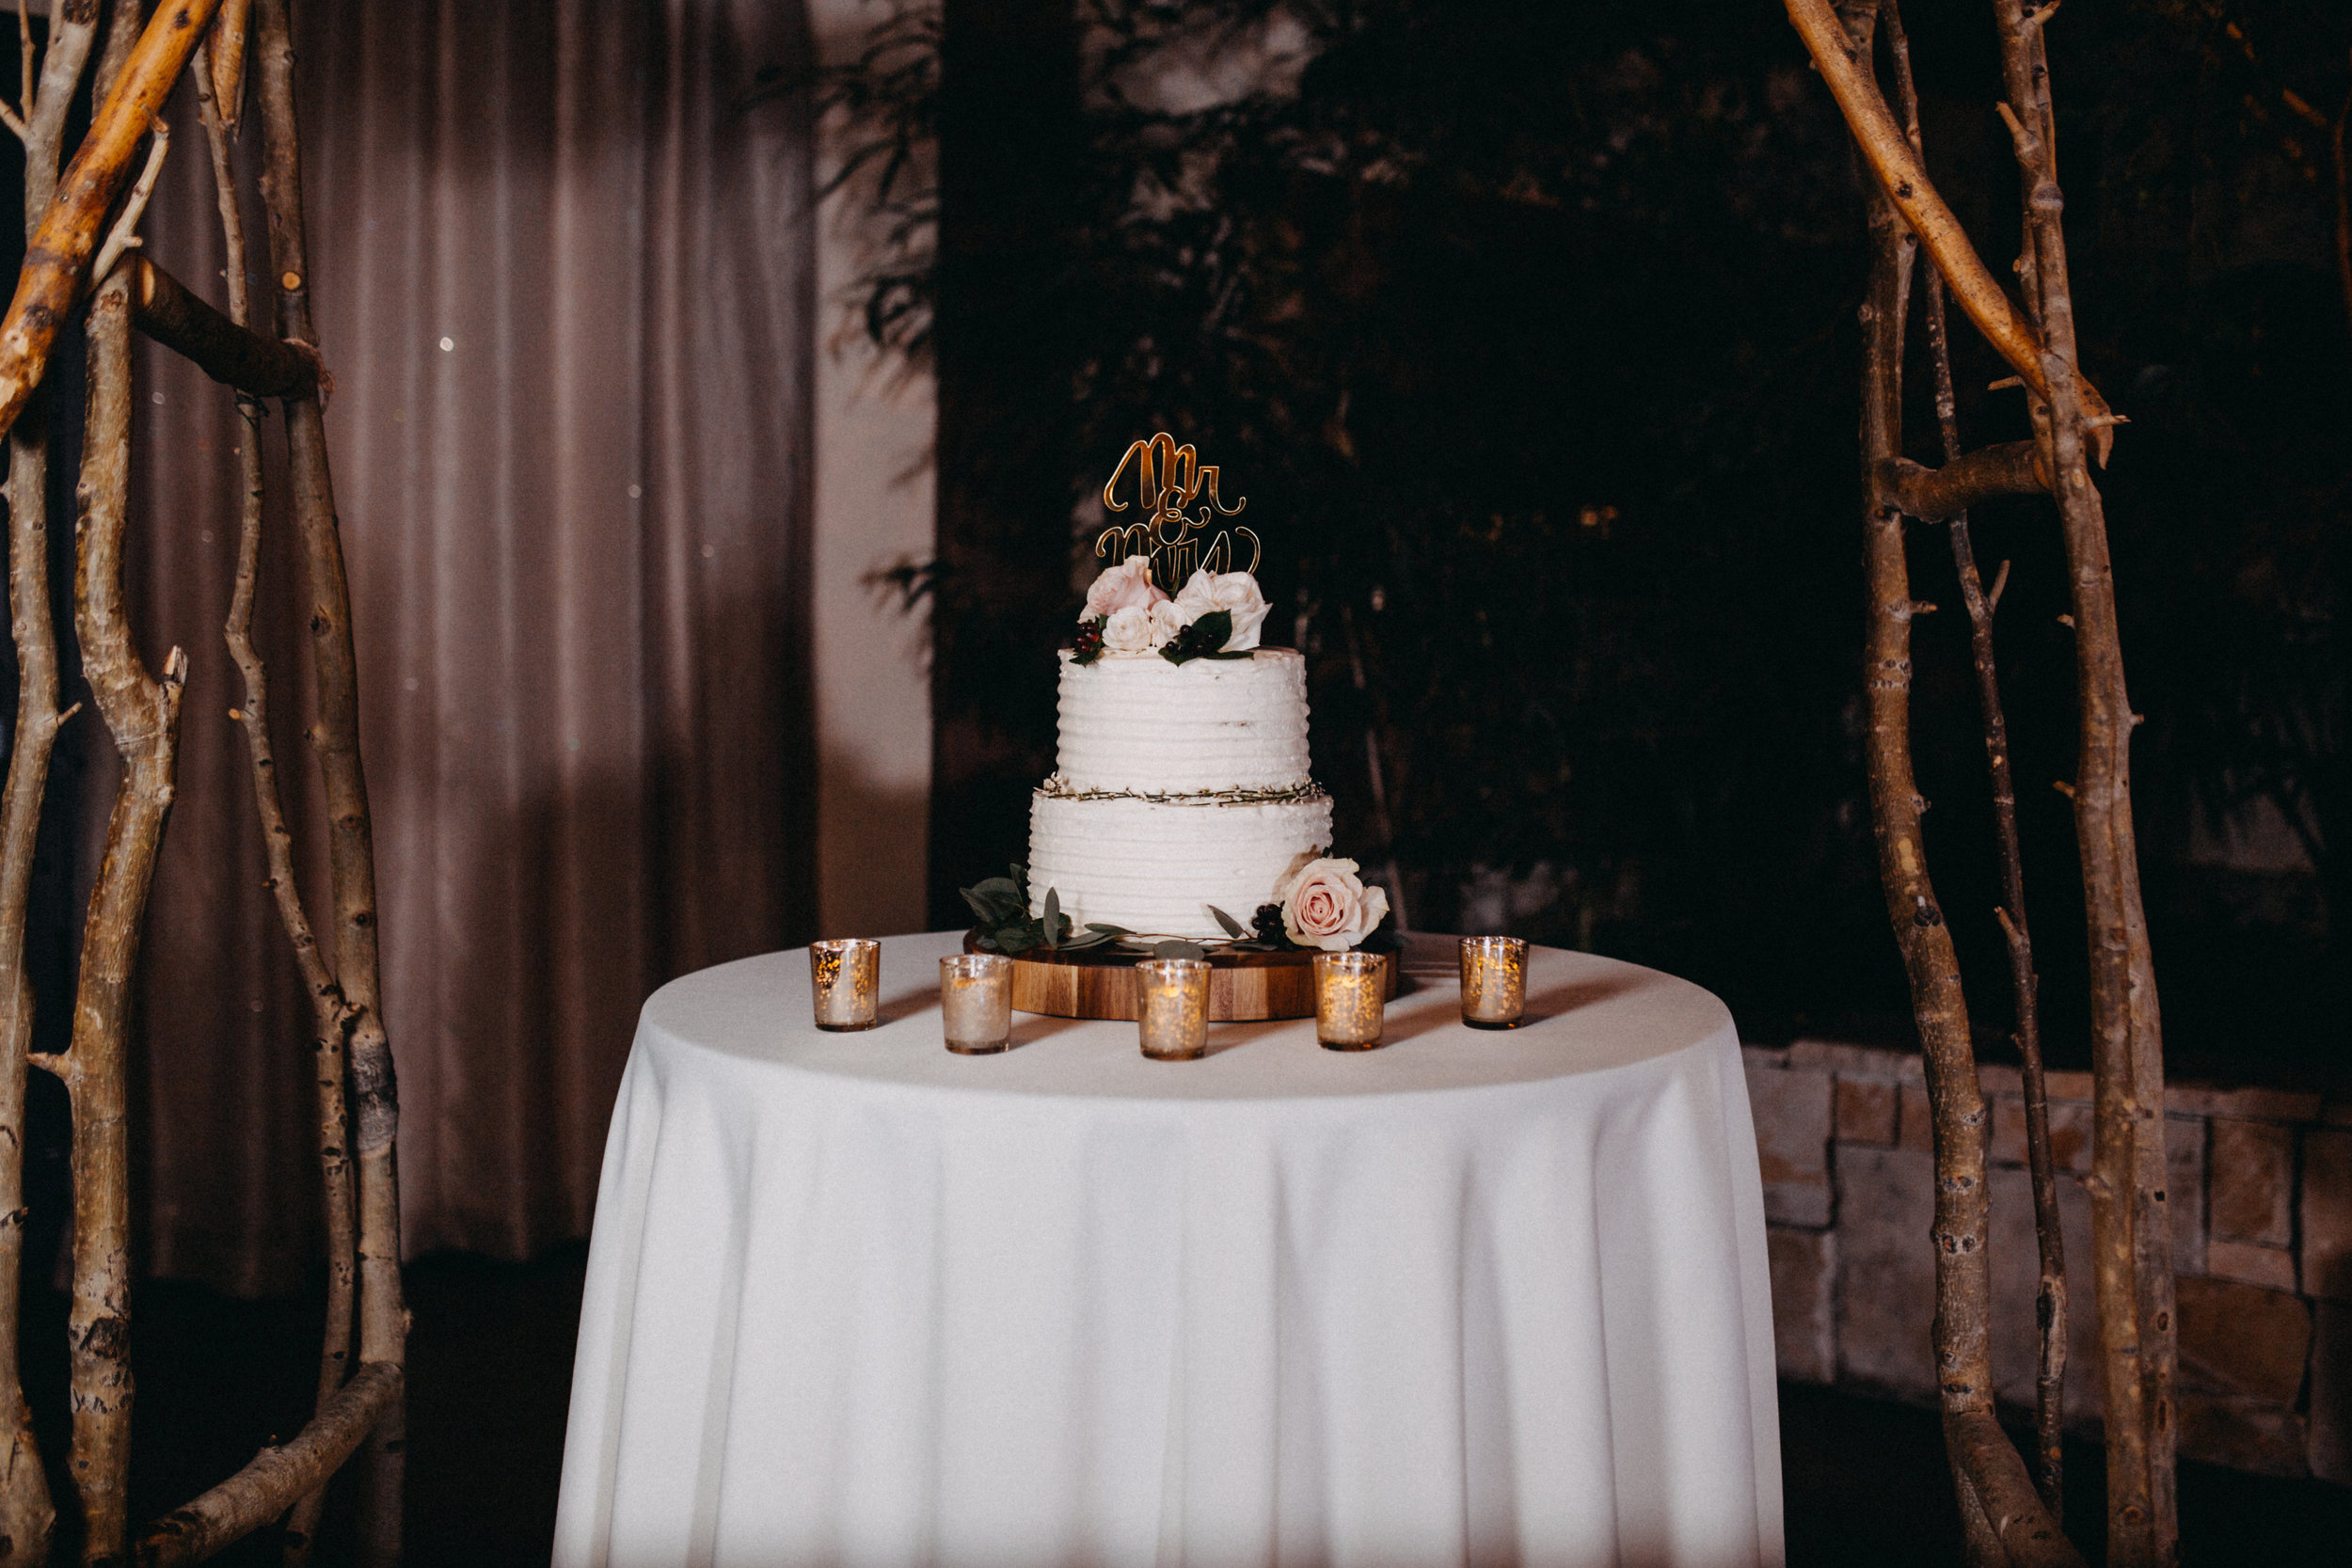 wedding photographer in lakewood colorado tiered wedding cake mr and mrs tea lights rustic wedding reception